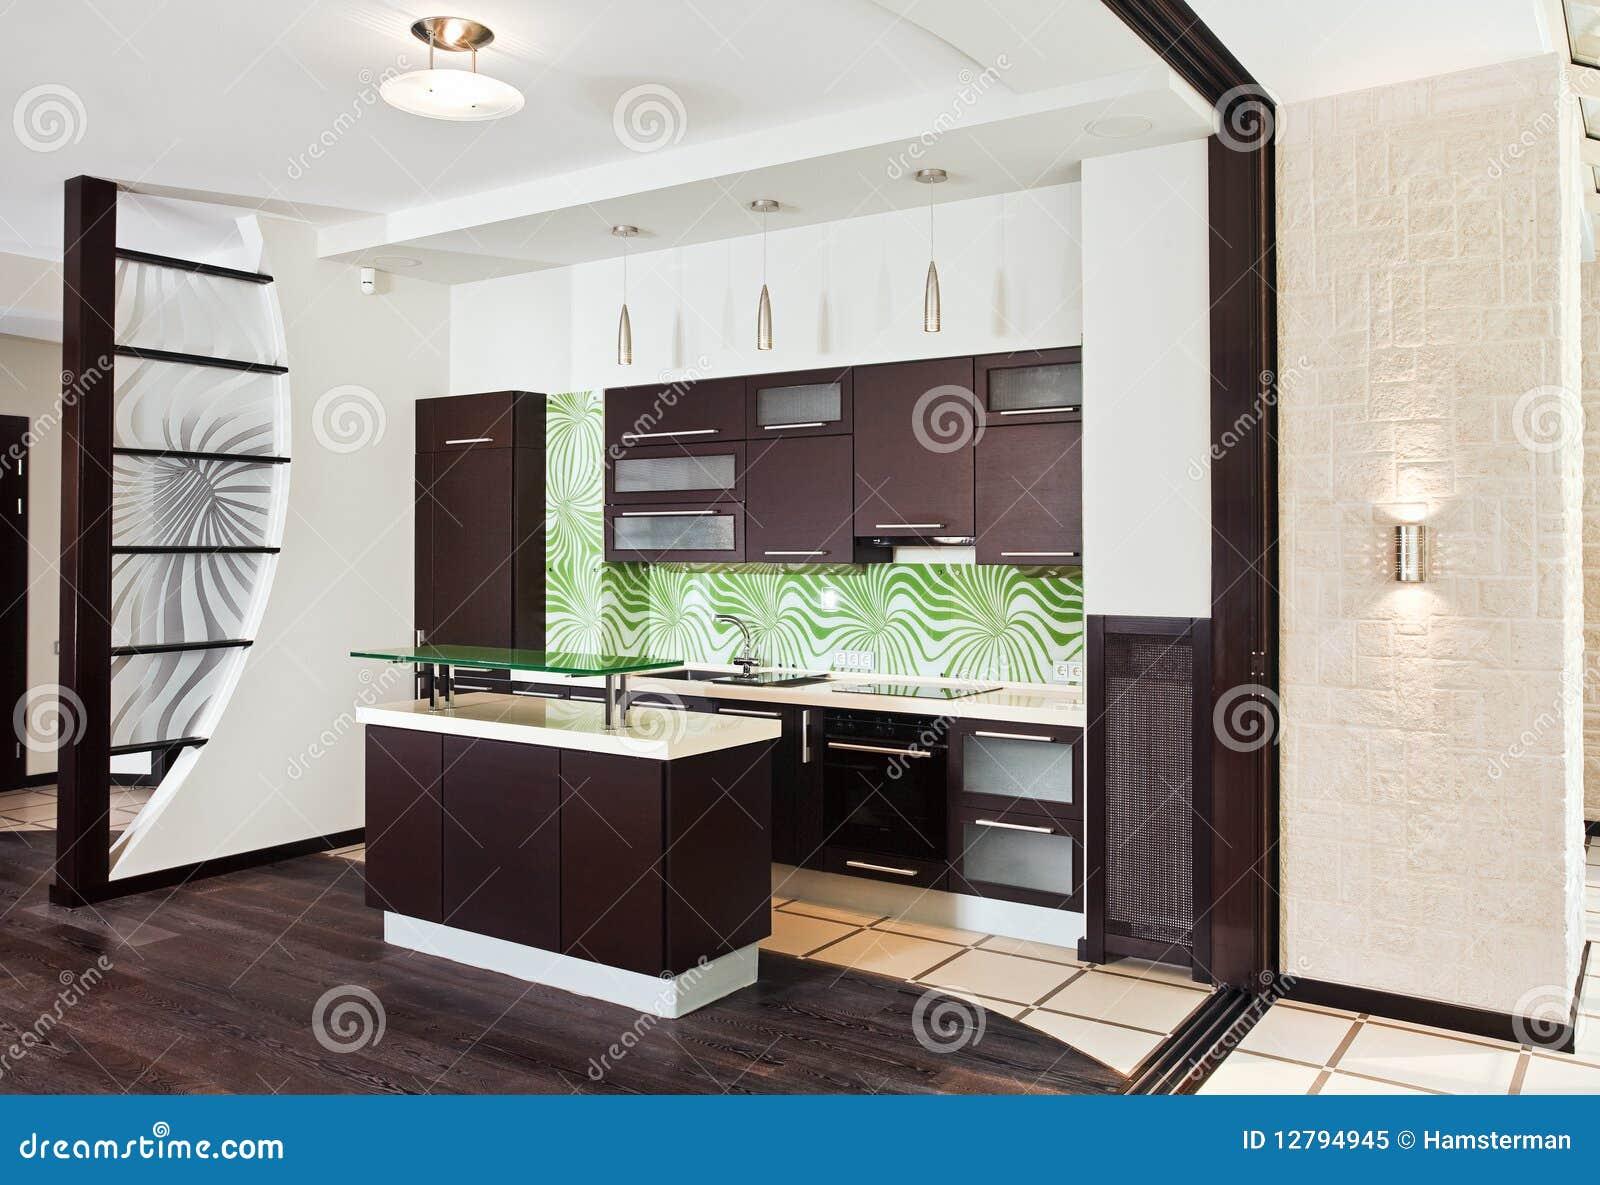 Moderne Keuken Met Donkere Houten Vloer Royalty-vrije Stock Foto ...